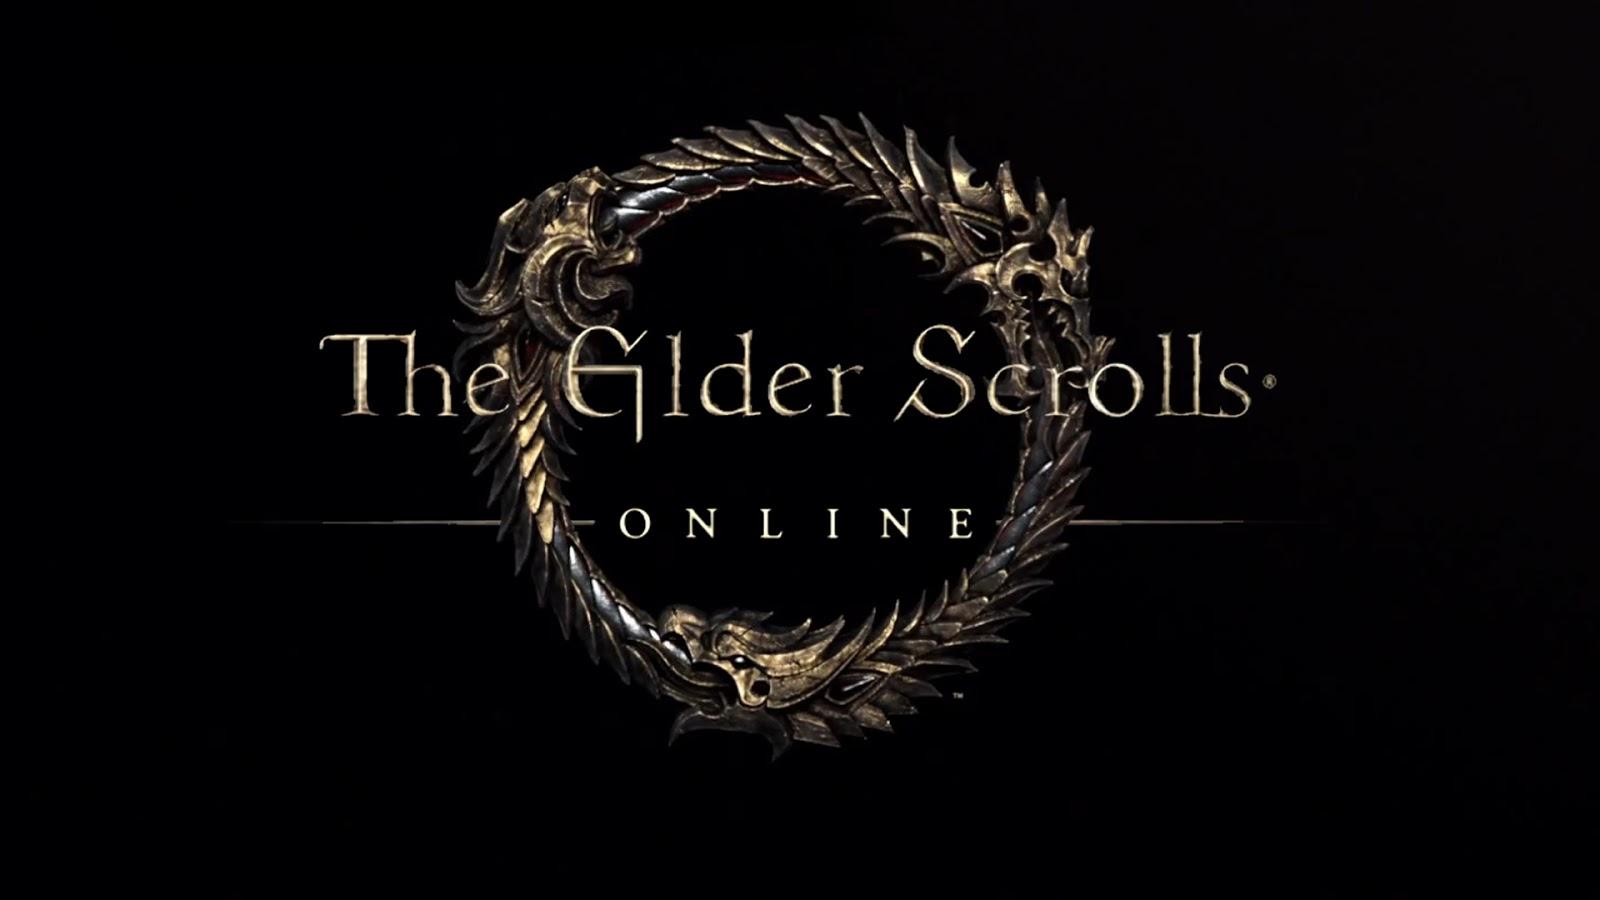 The-Elder-Scrolls-Online-1.jpg